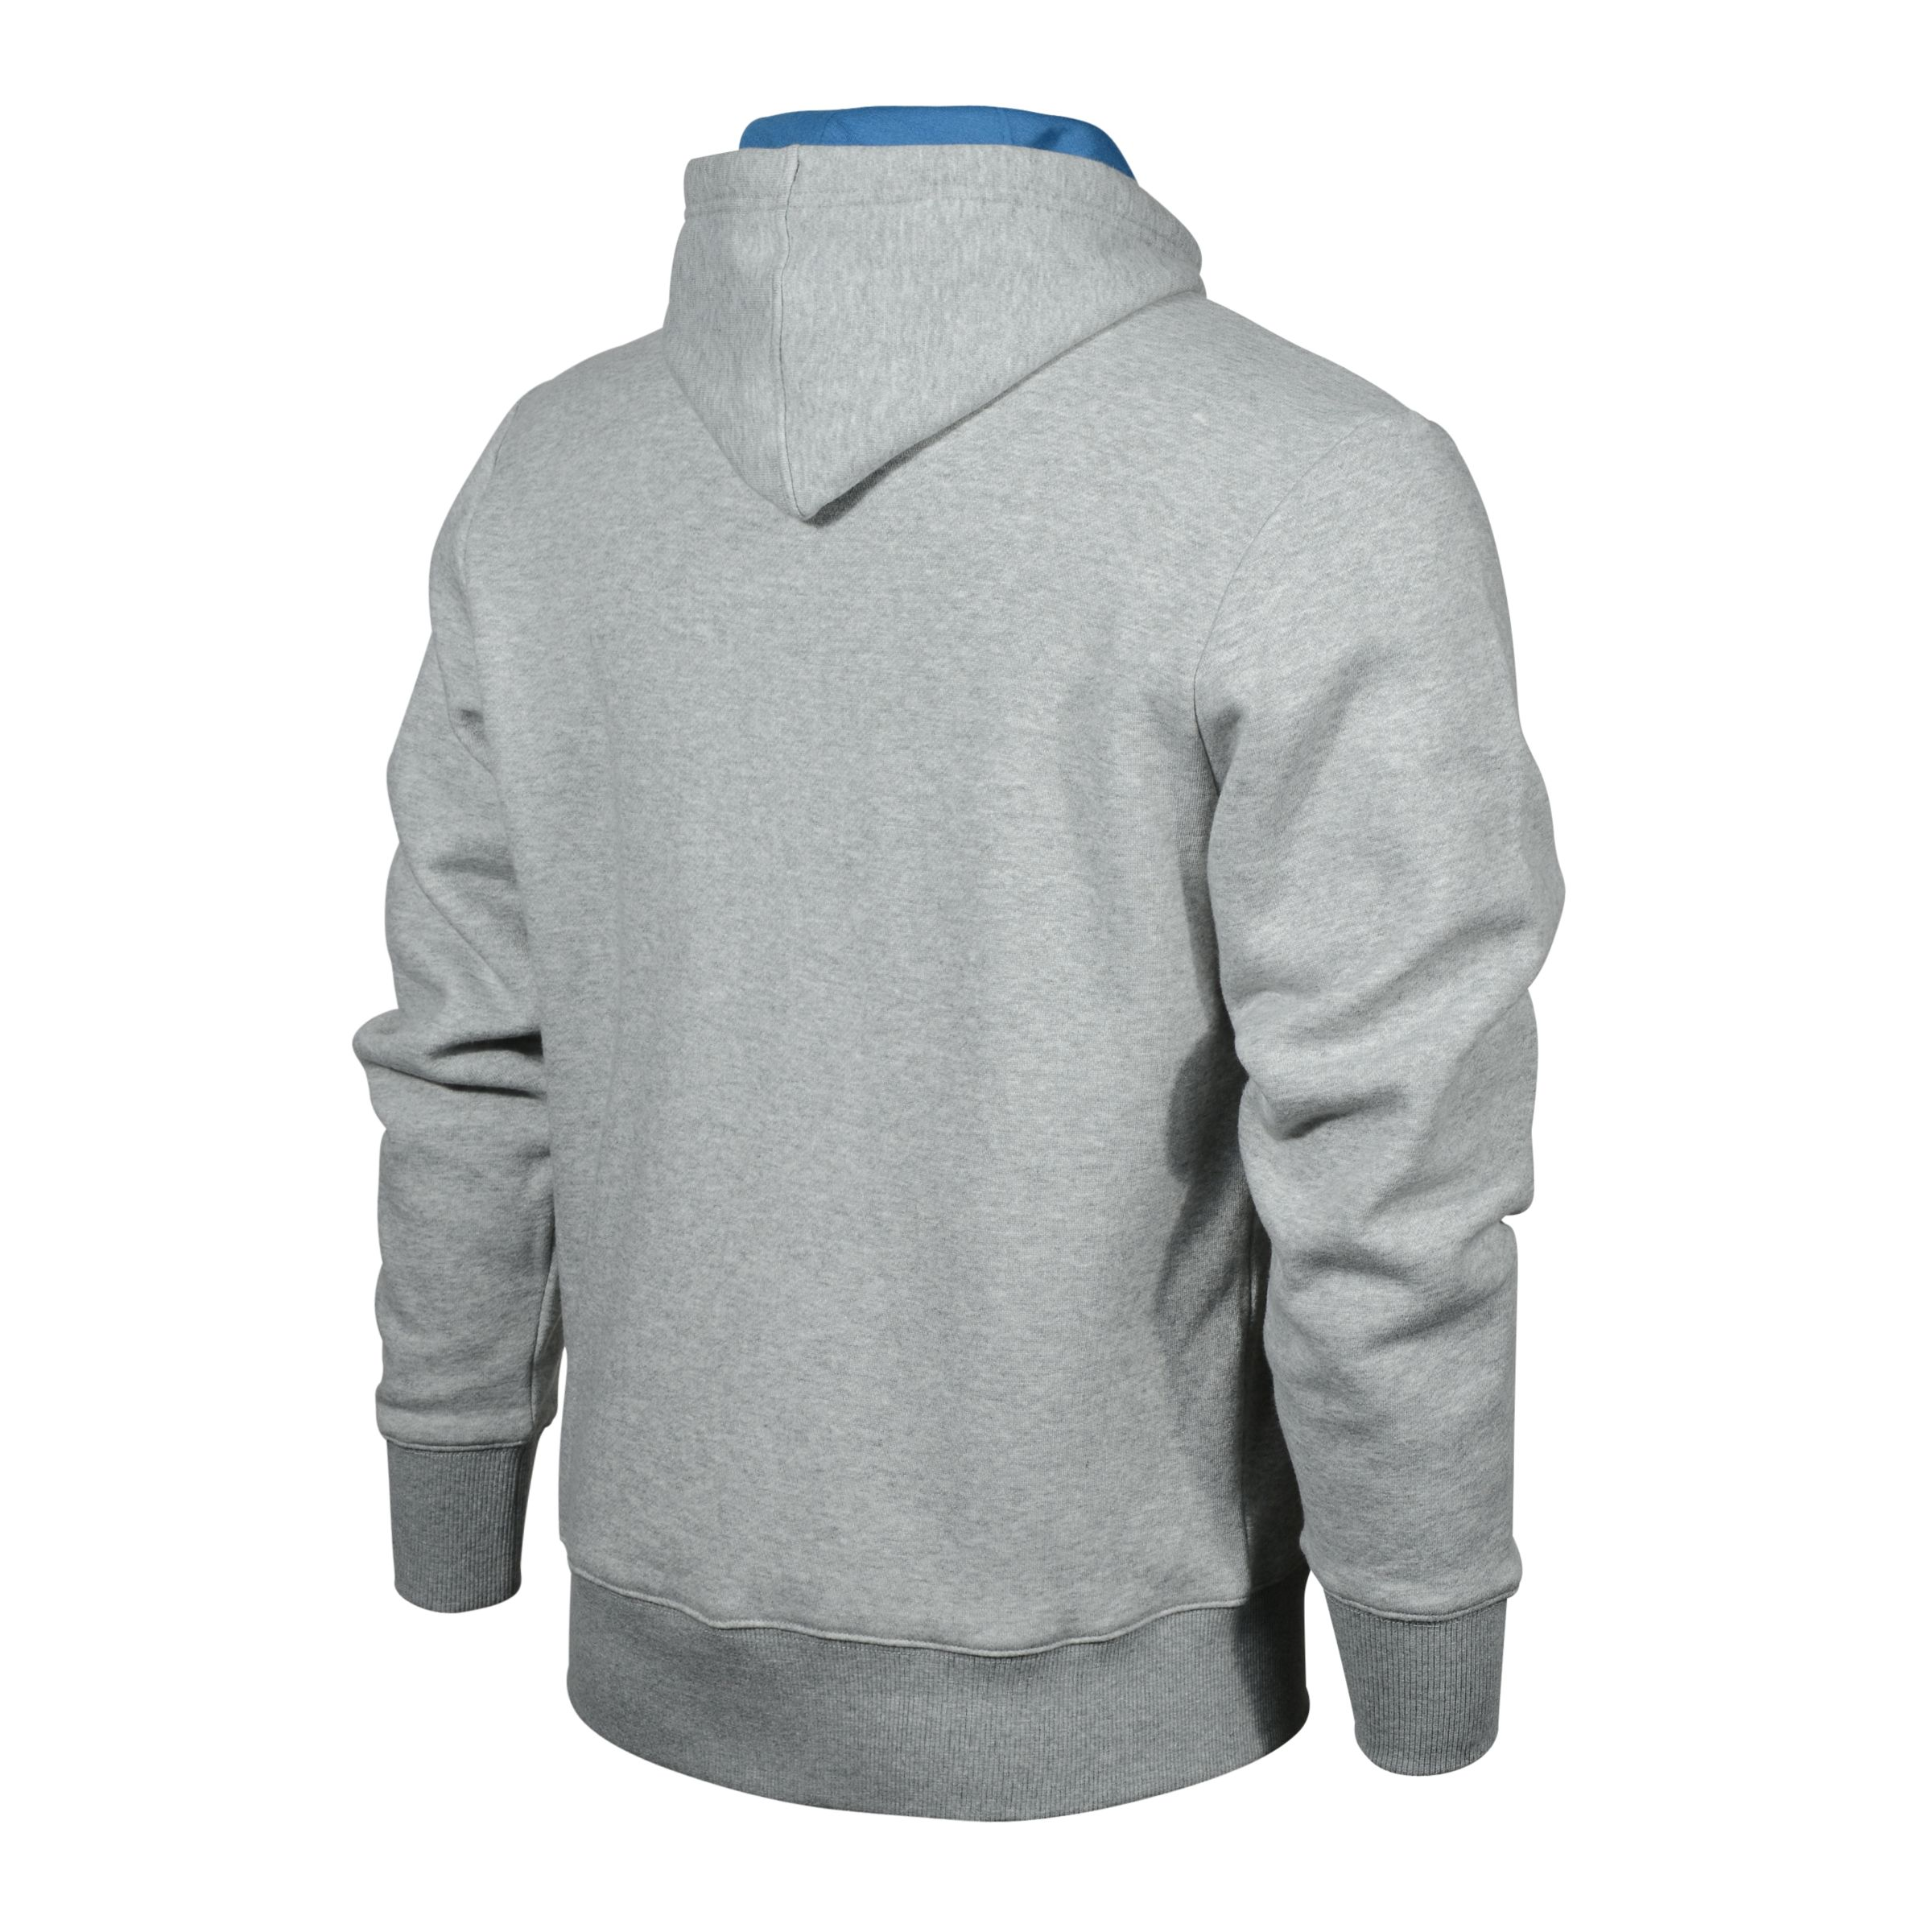 thumbnail 4 - New Balance HOODIE Fleece Men's Top Long Sleeve Athletic Fit